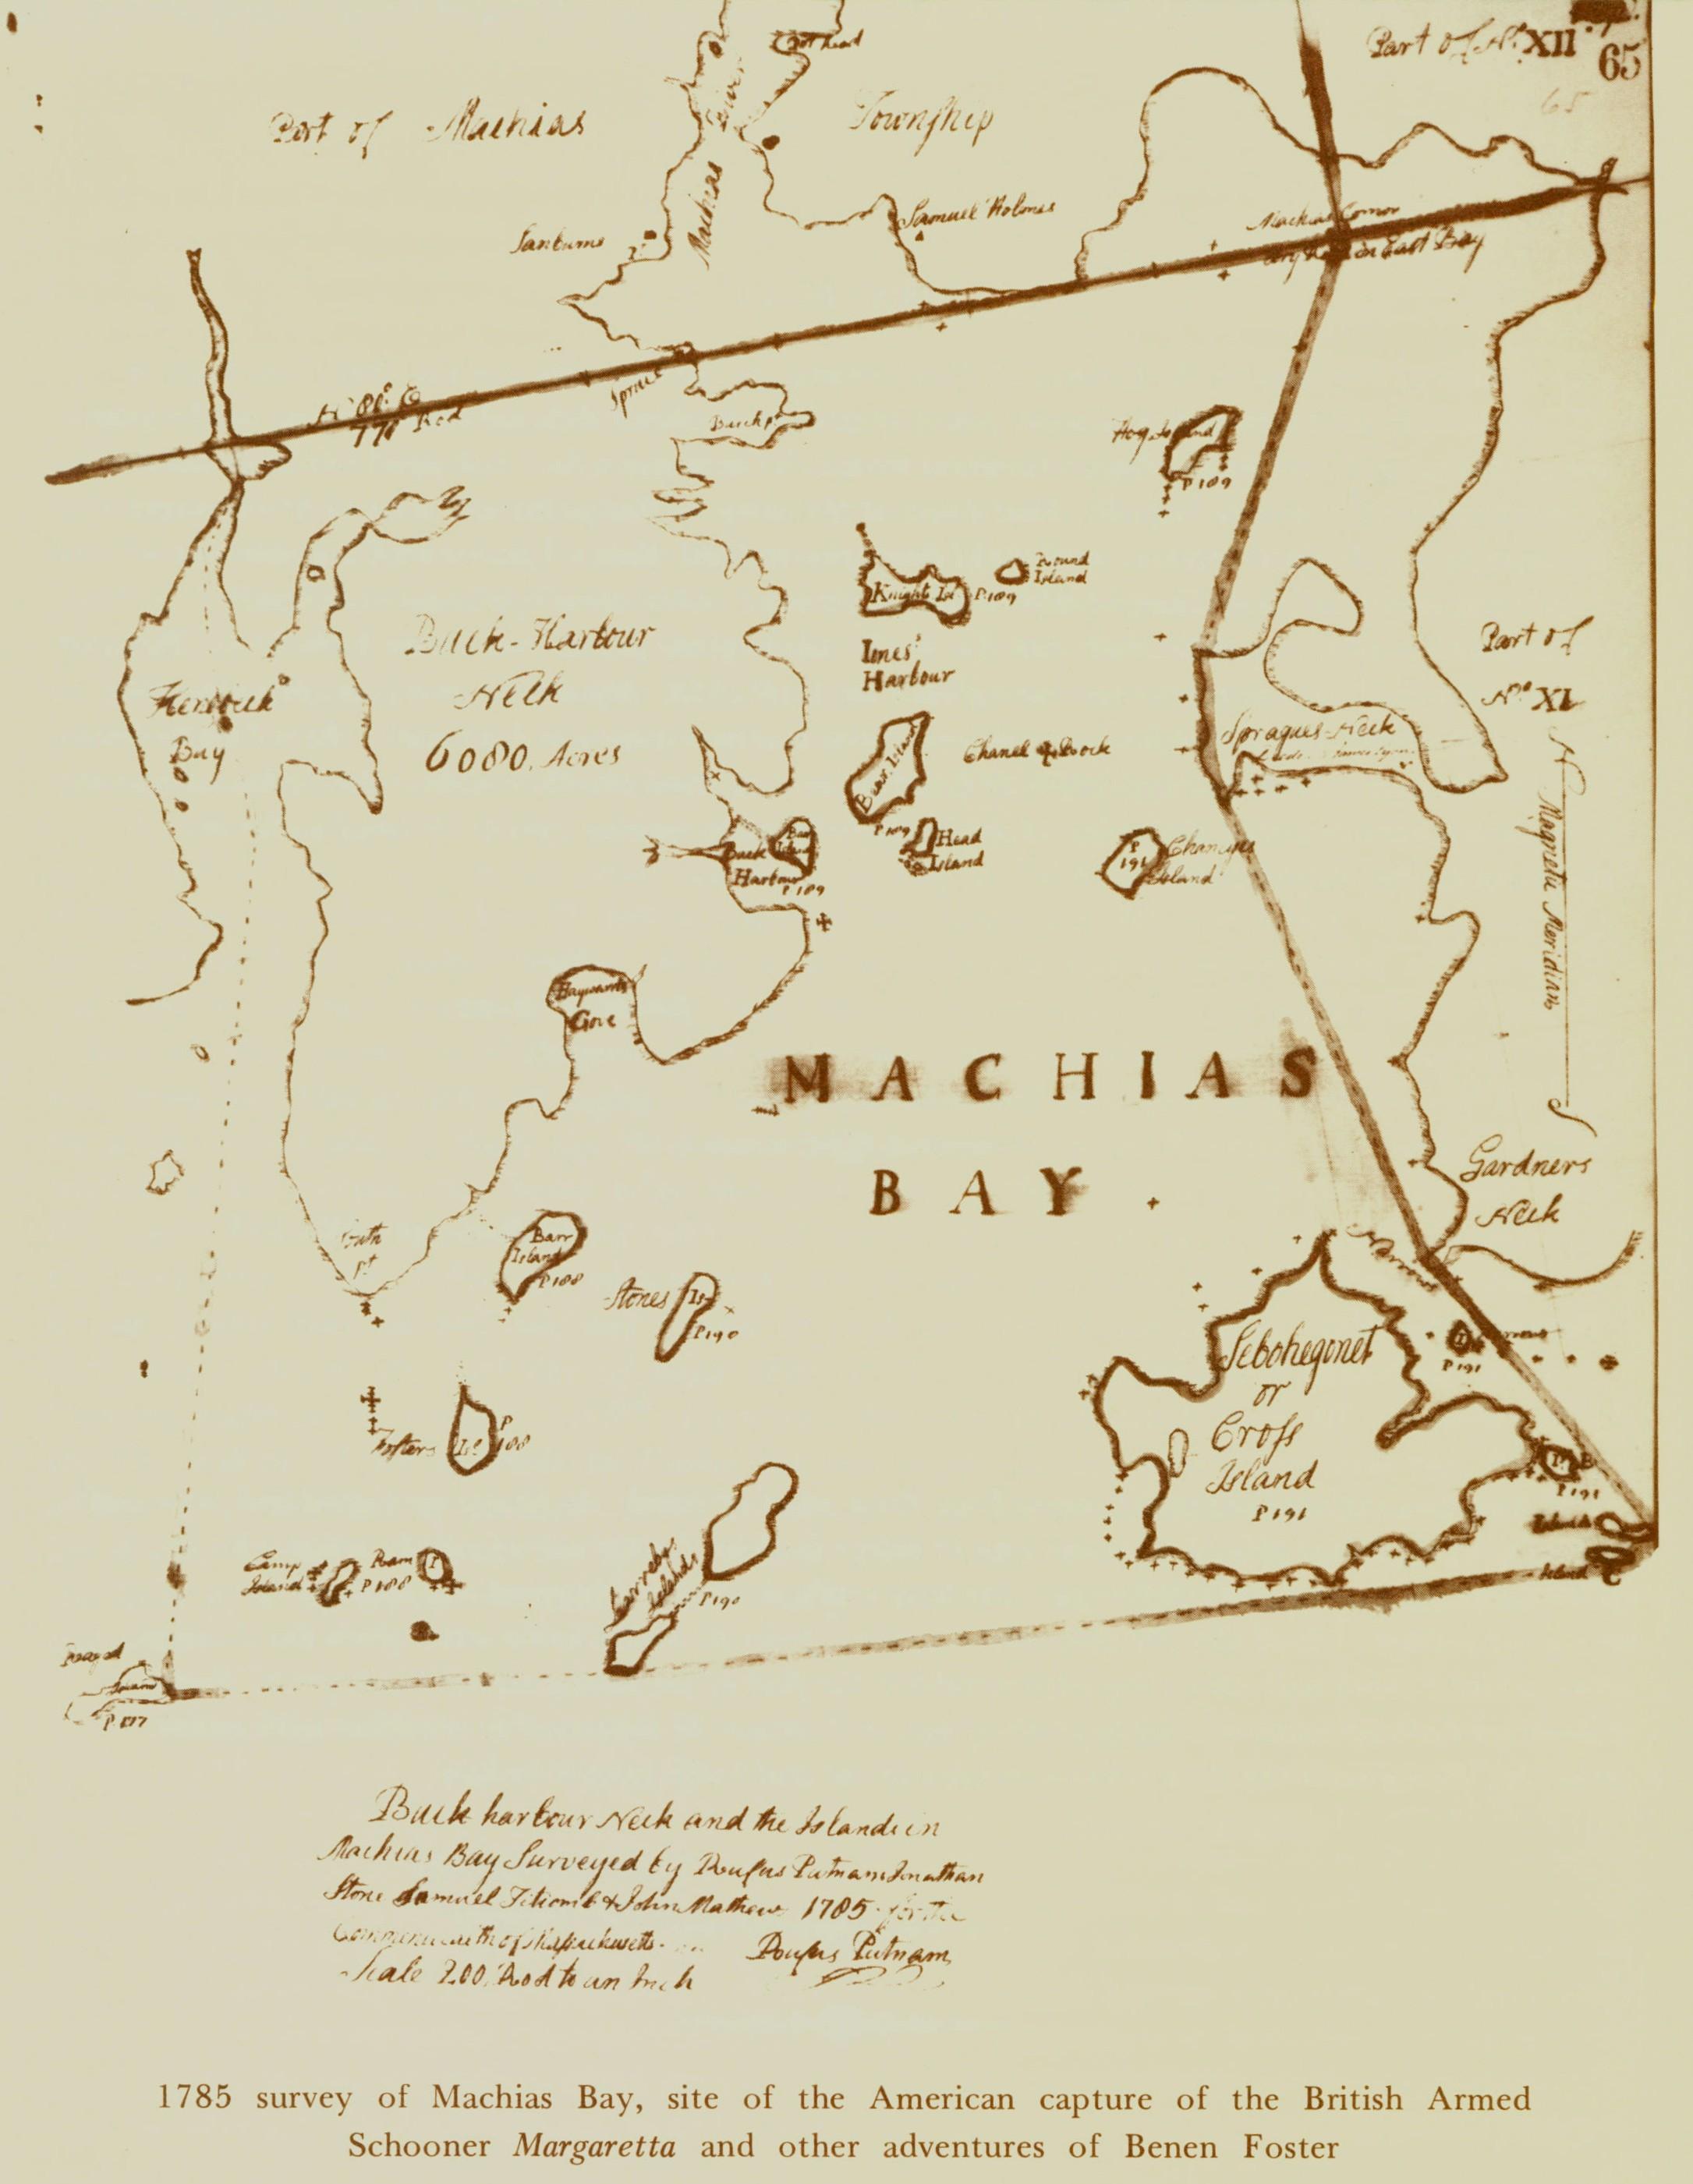 Machbay 1785 In American History